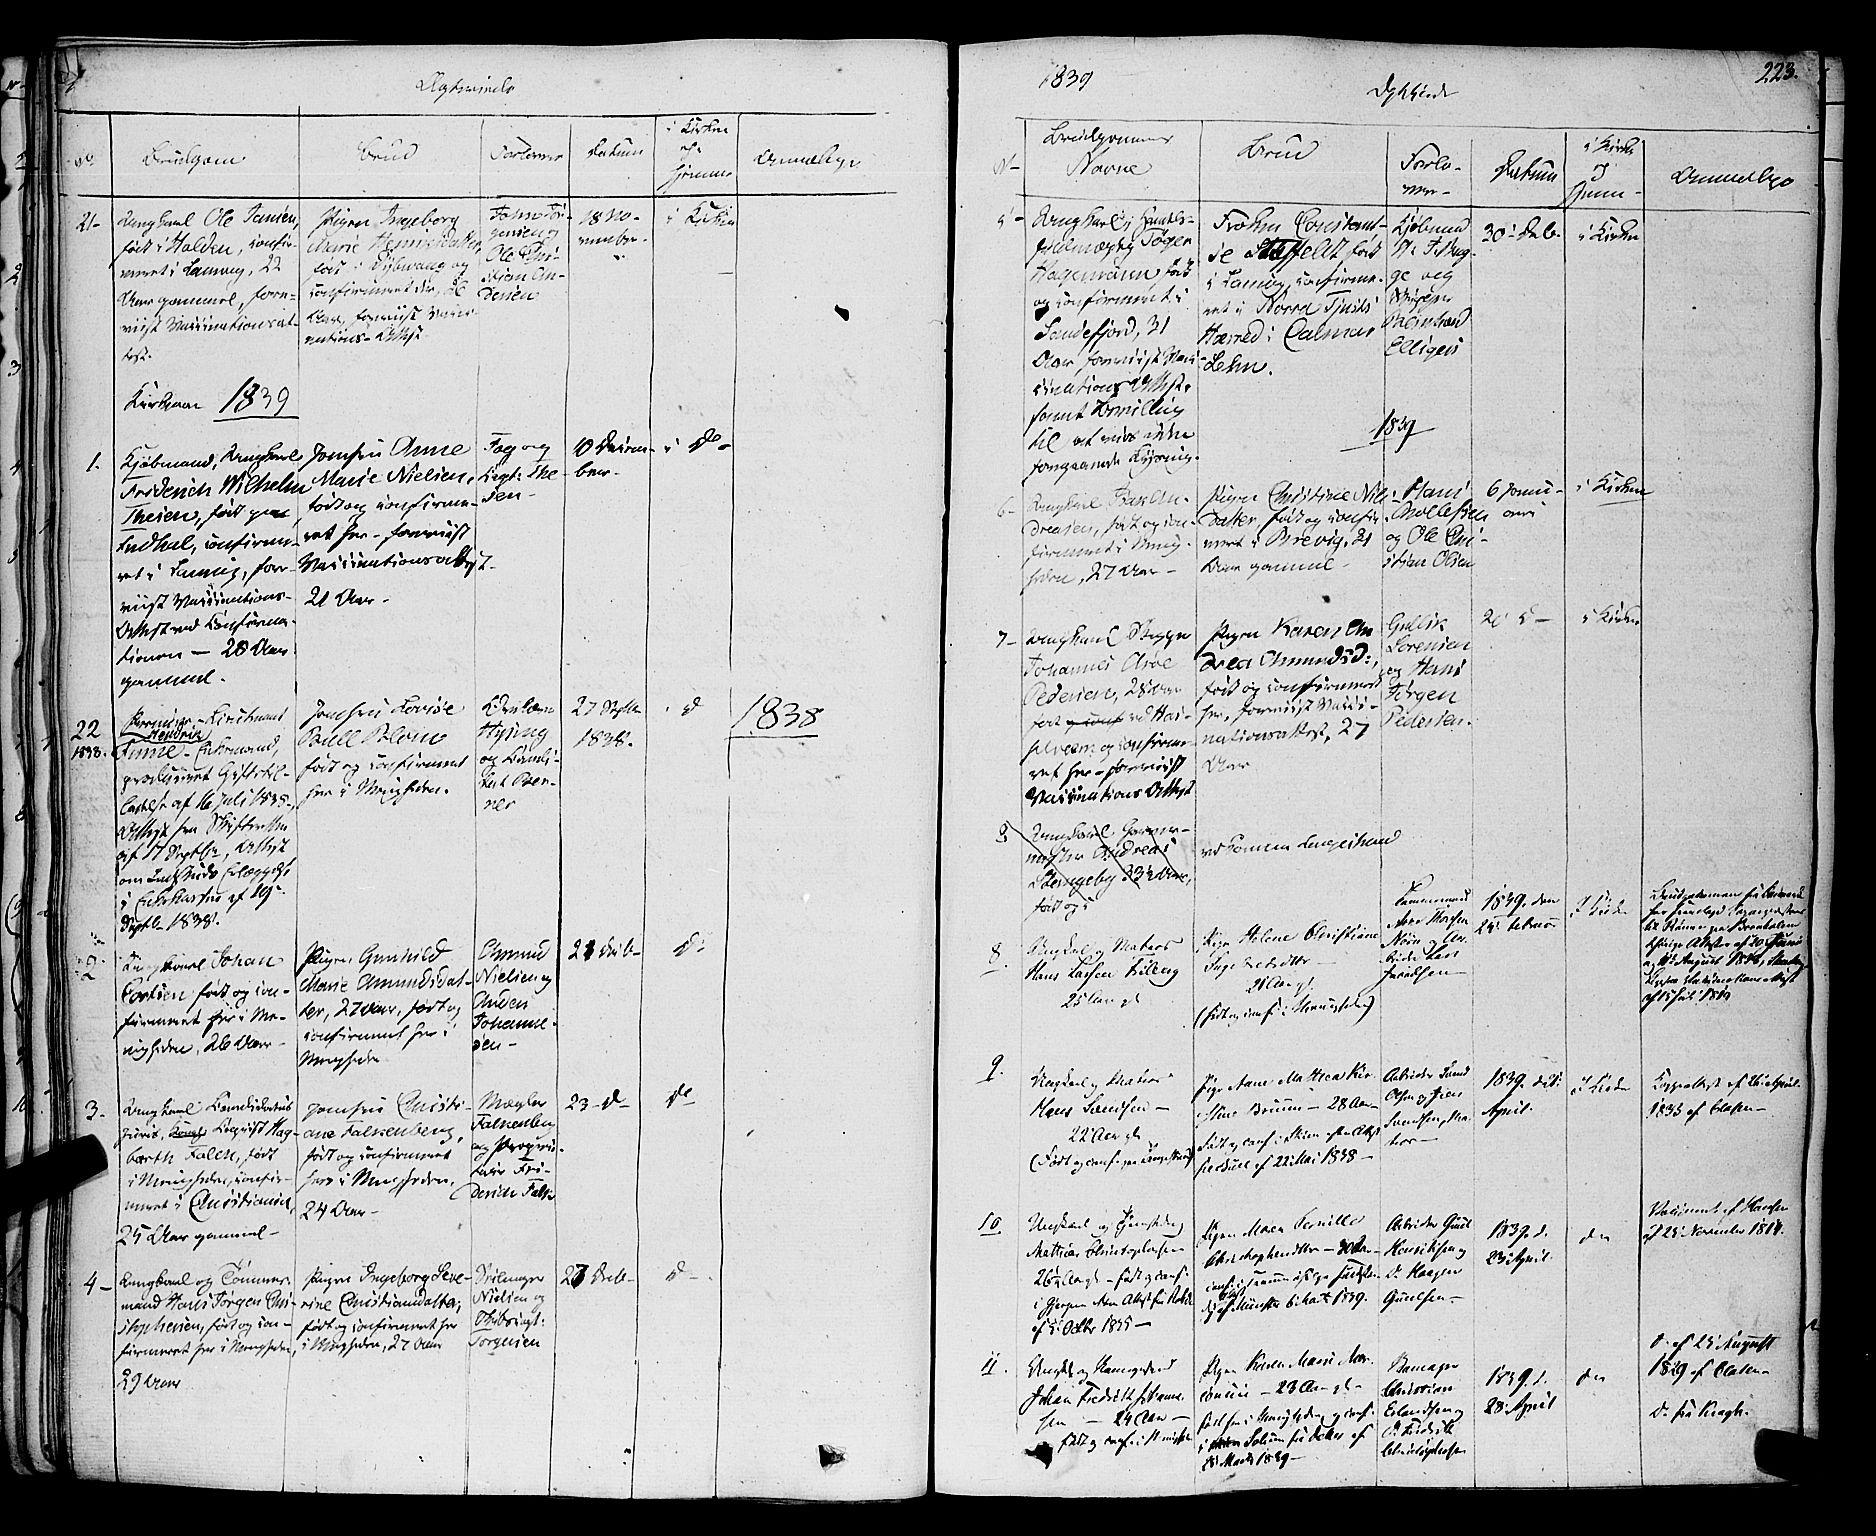 SAKO, Larvik kirkebøker, F/Fa/L0002: Ministerialbok nr. I 2, 1825-1847, s. 223